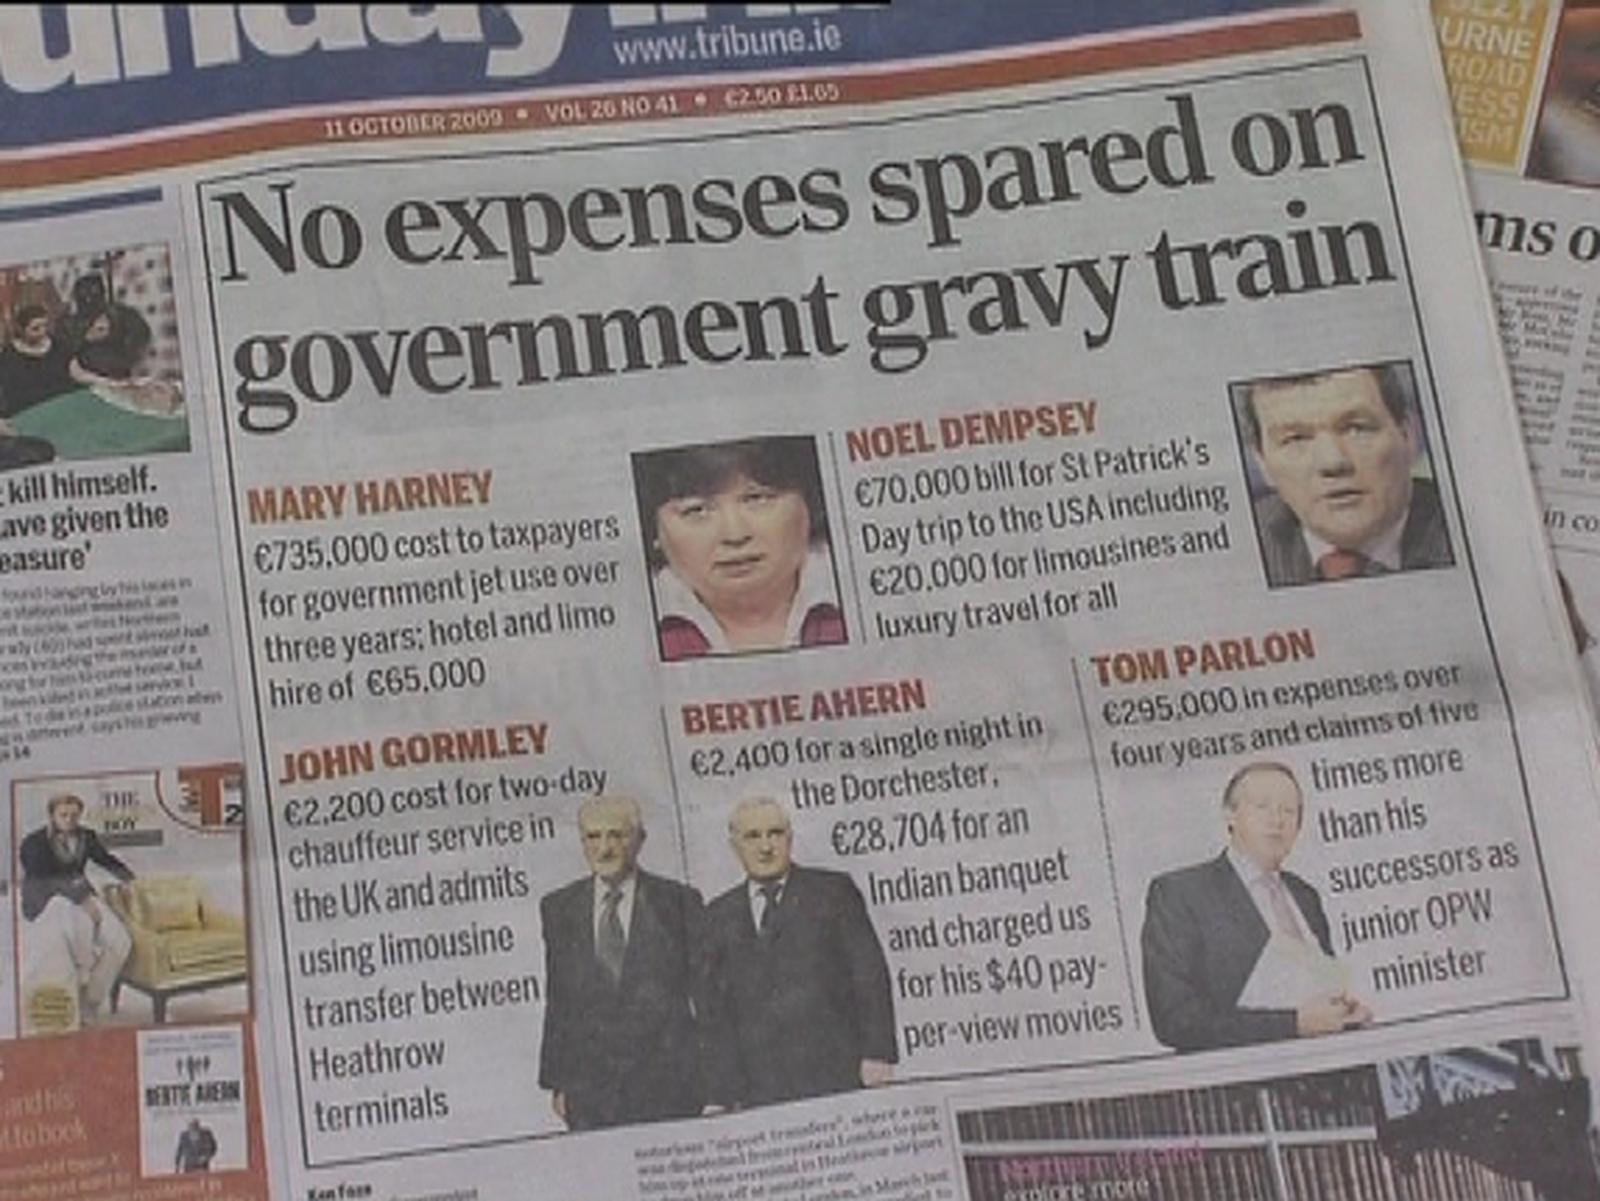 Govt again promises expenses reform